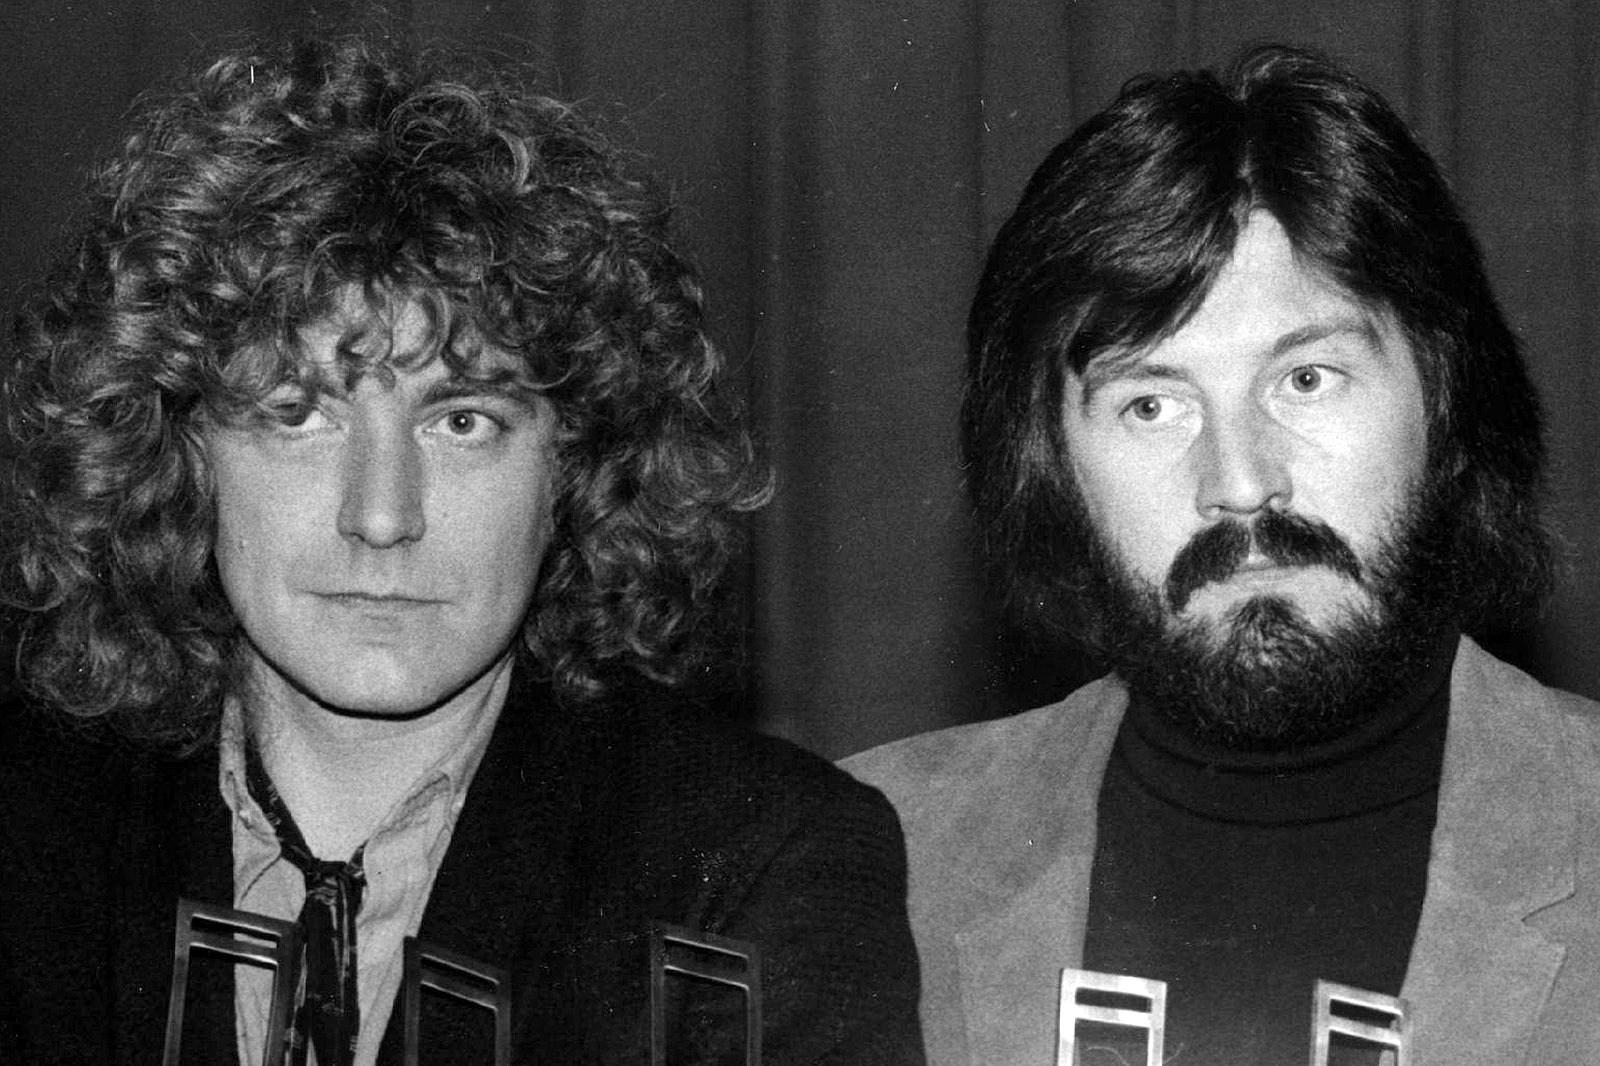 Robert Plant's Lockdown Dreams About John Bonham